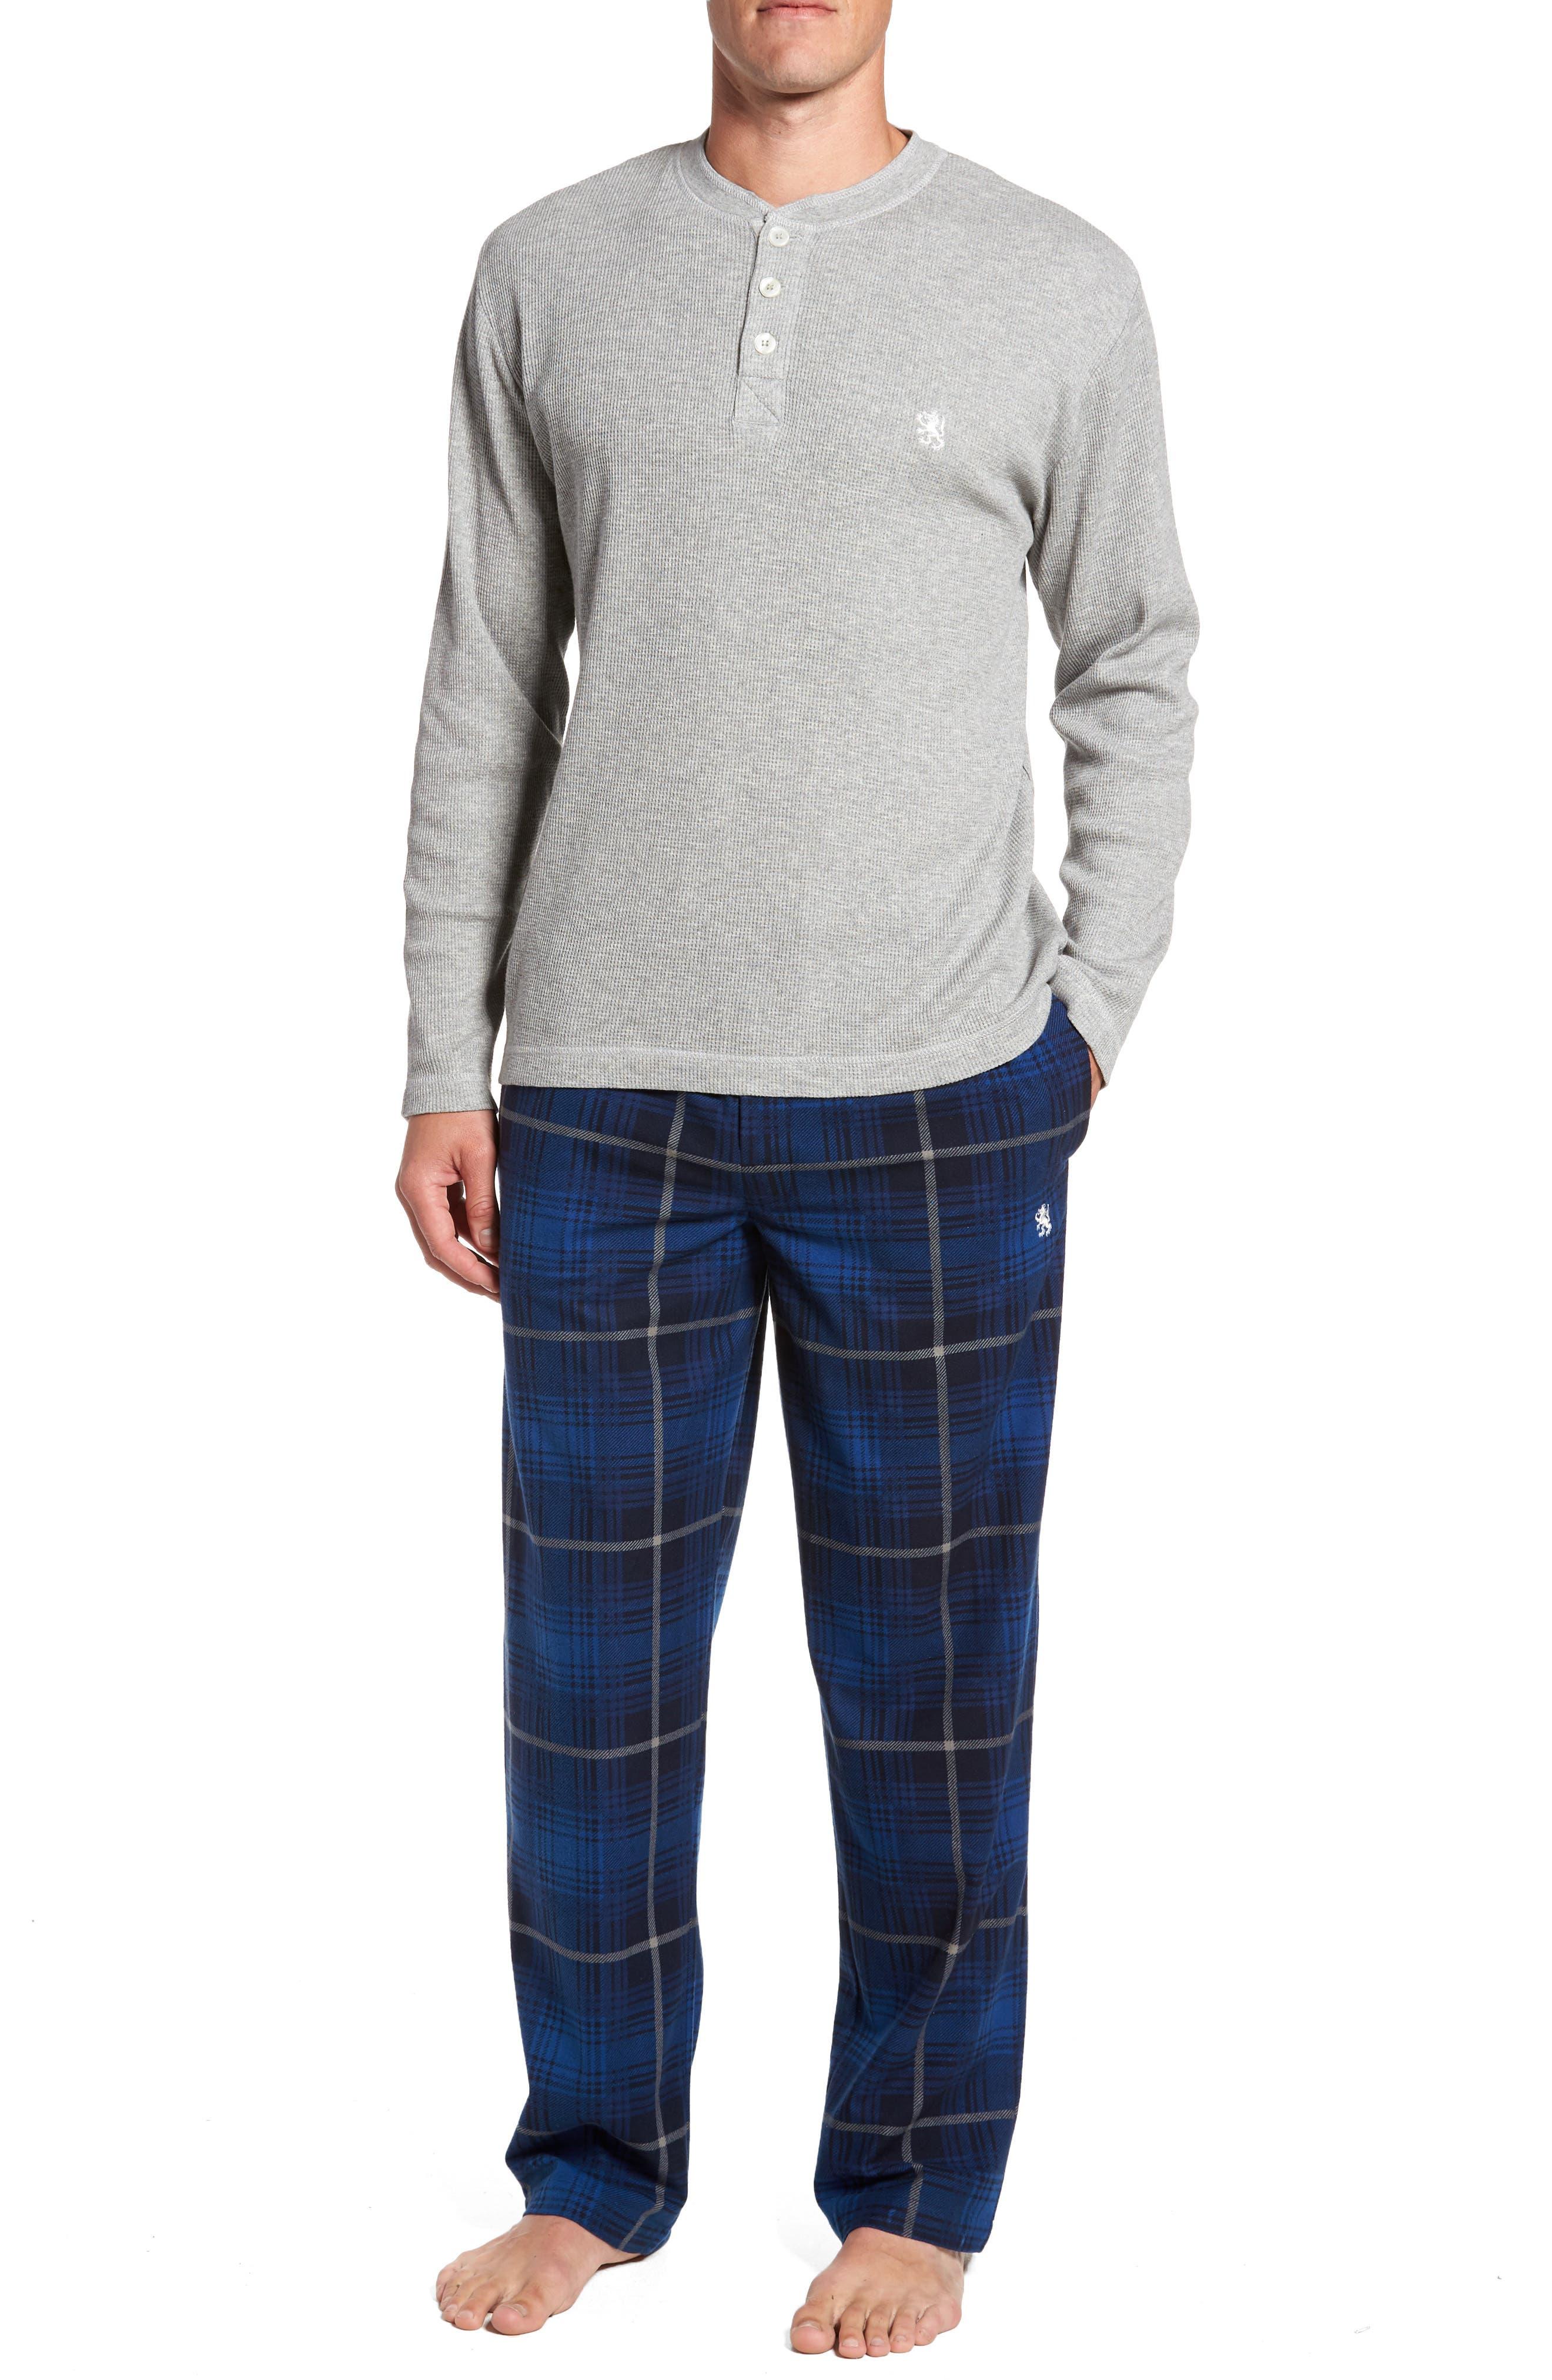 Main Image - Majestic International Nifty Gift Henley Shirt & Lounge Pants